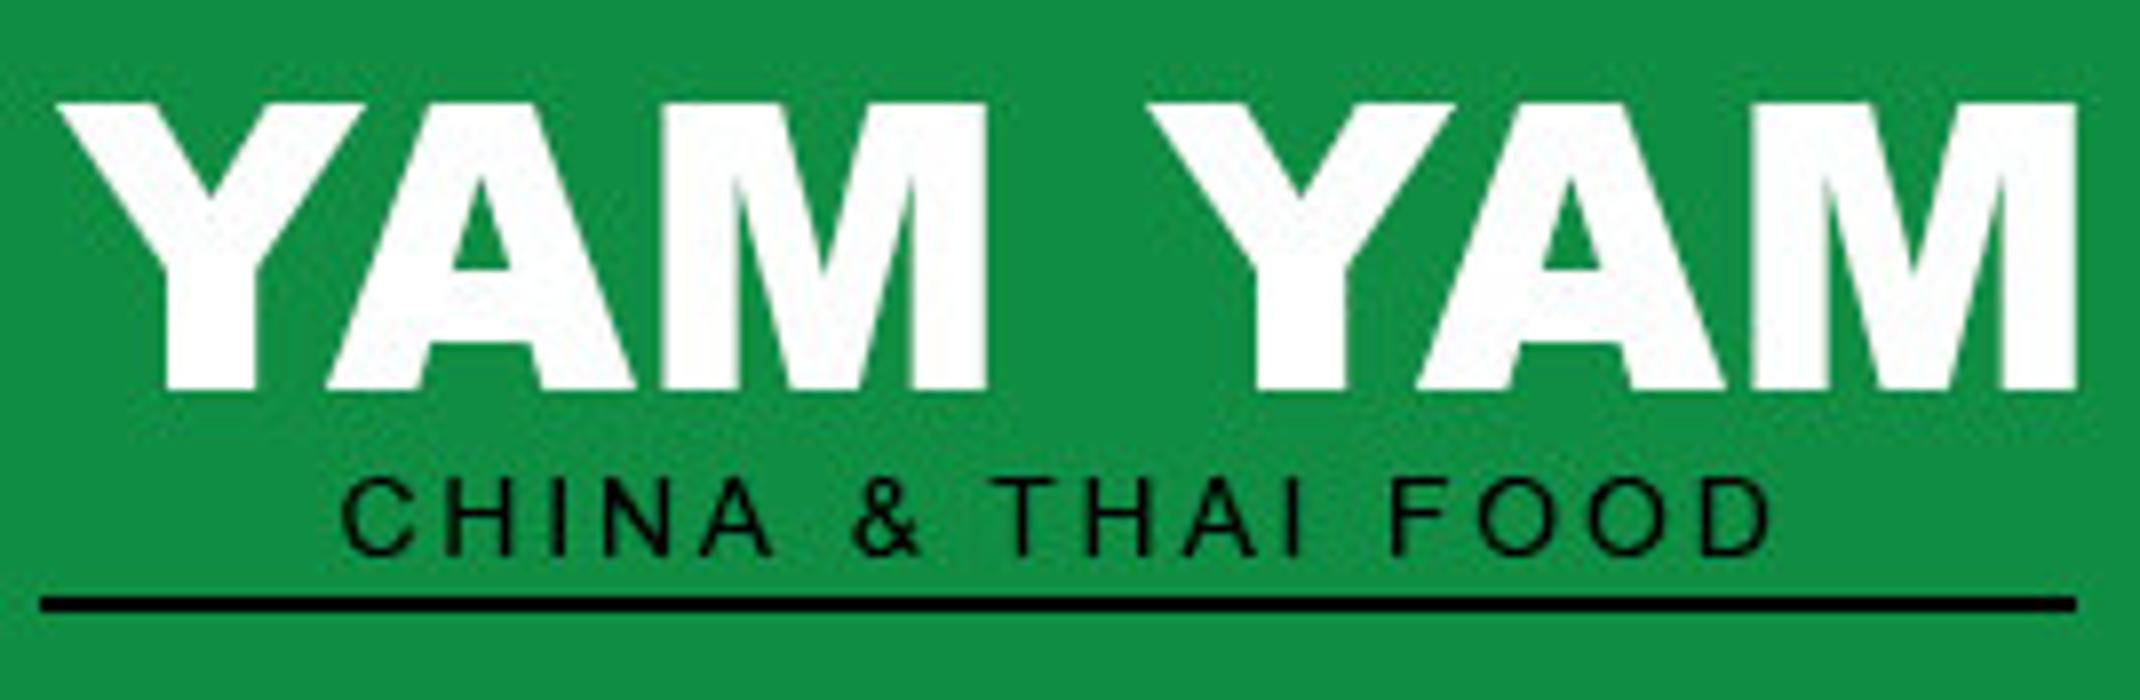 Bild zu Yam Yam China &Thai Food in Baden-Baden